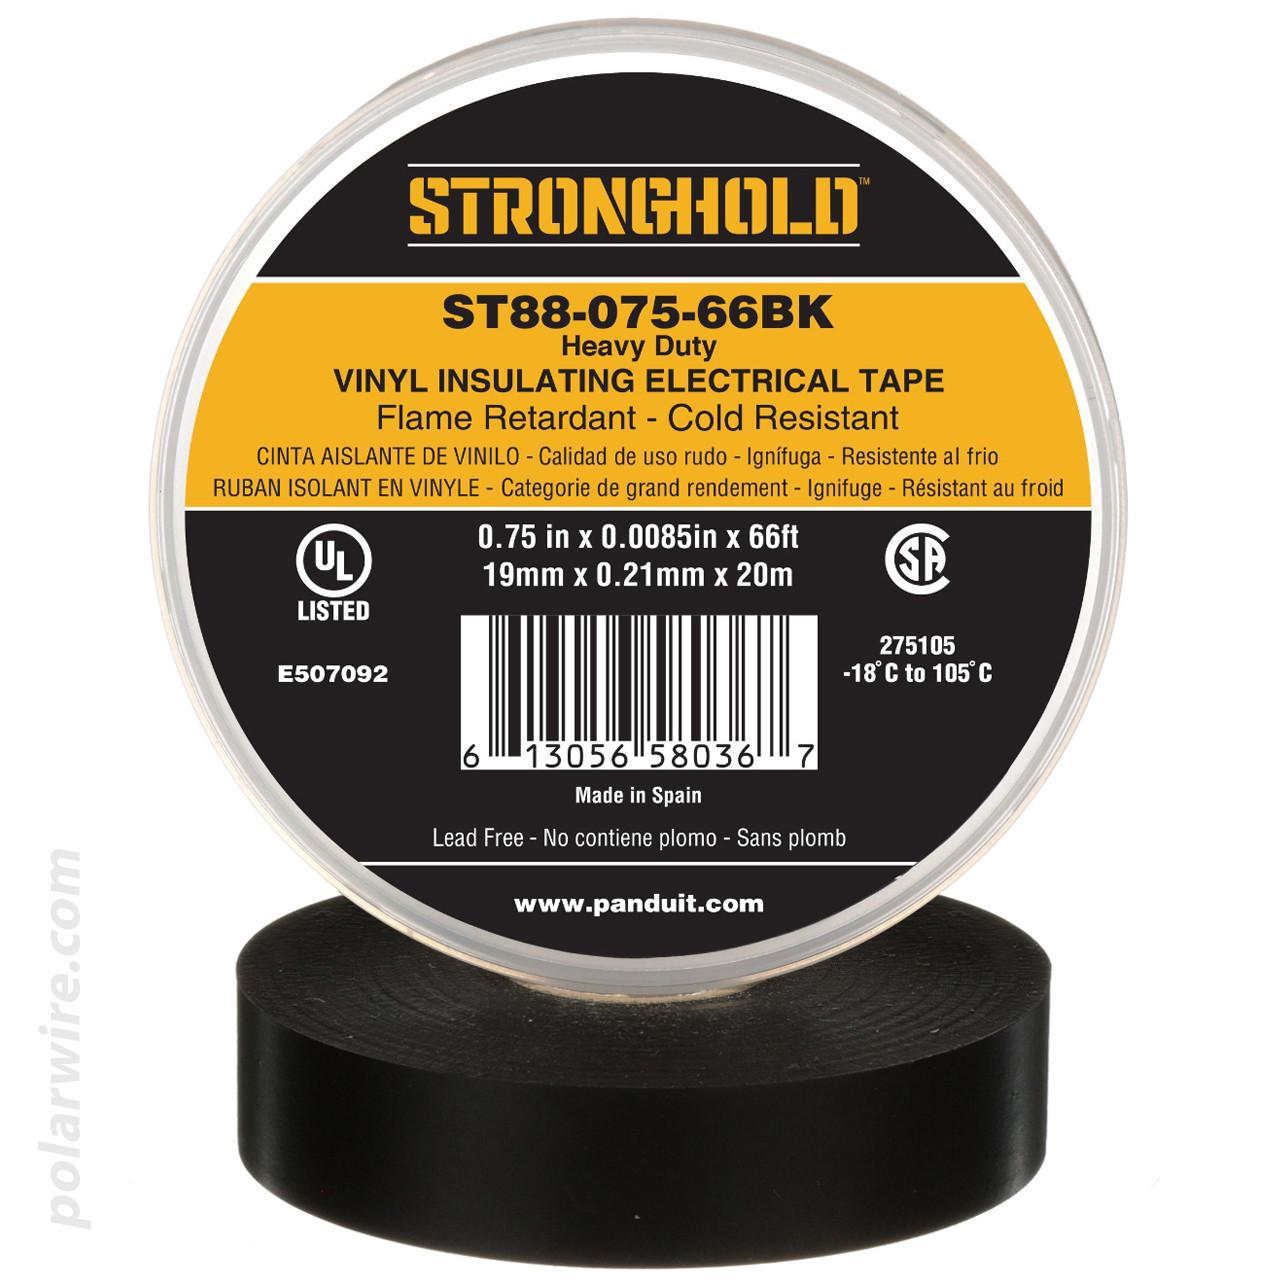 3/4 inch Black PVC Vinyl Heavy Duty Electrical Tape Panduit Stronghold